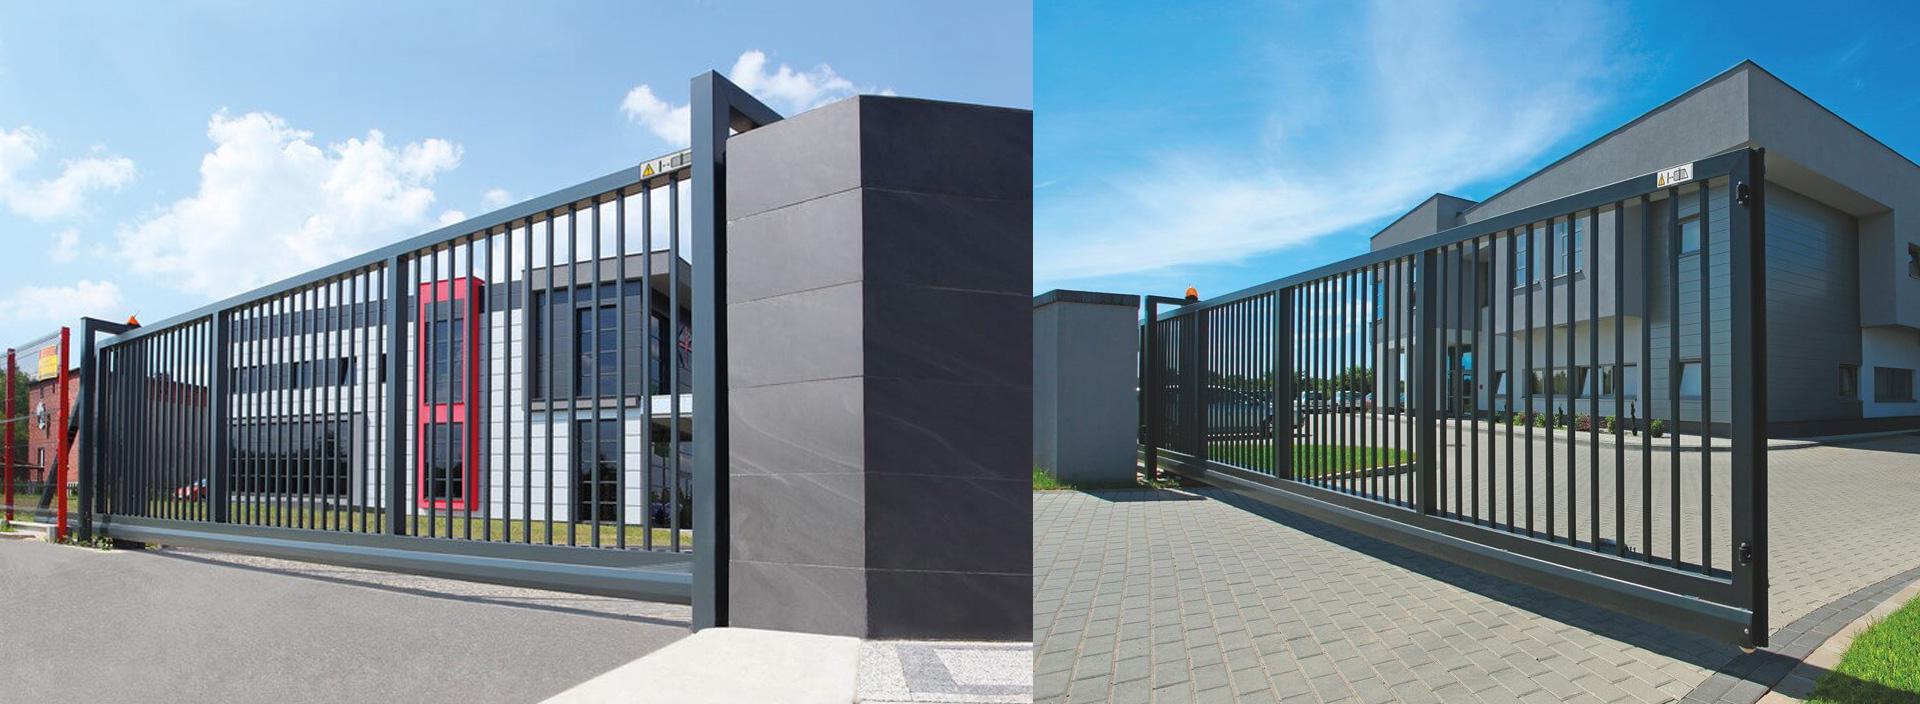 sliding-gates-stebilex-systems